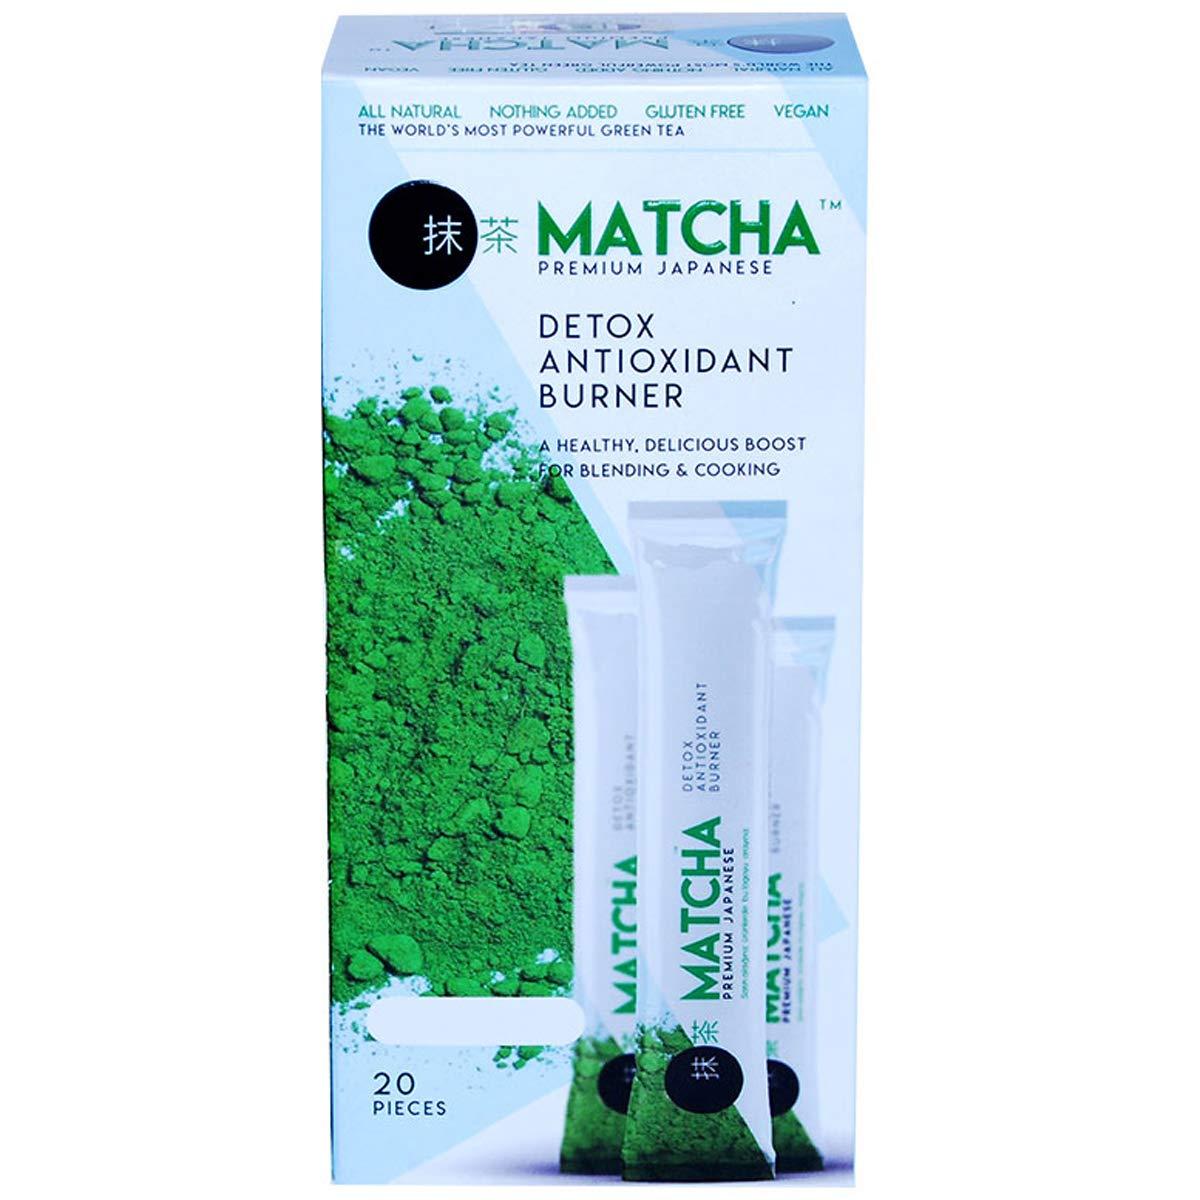 Matcha Green Tea Powder Organically Grown Japanese Natural Tea (20 pcs x 10g)